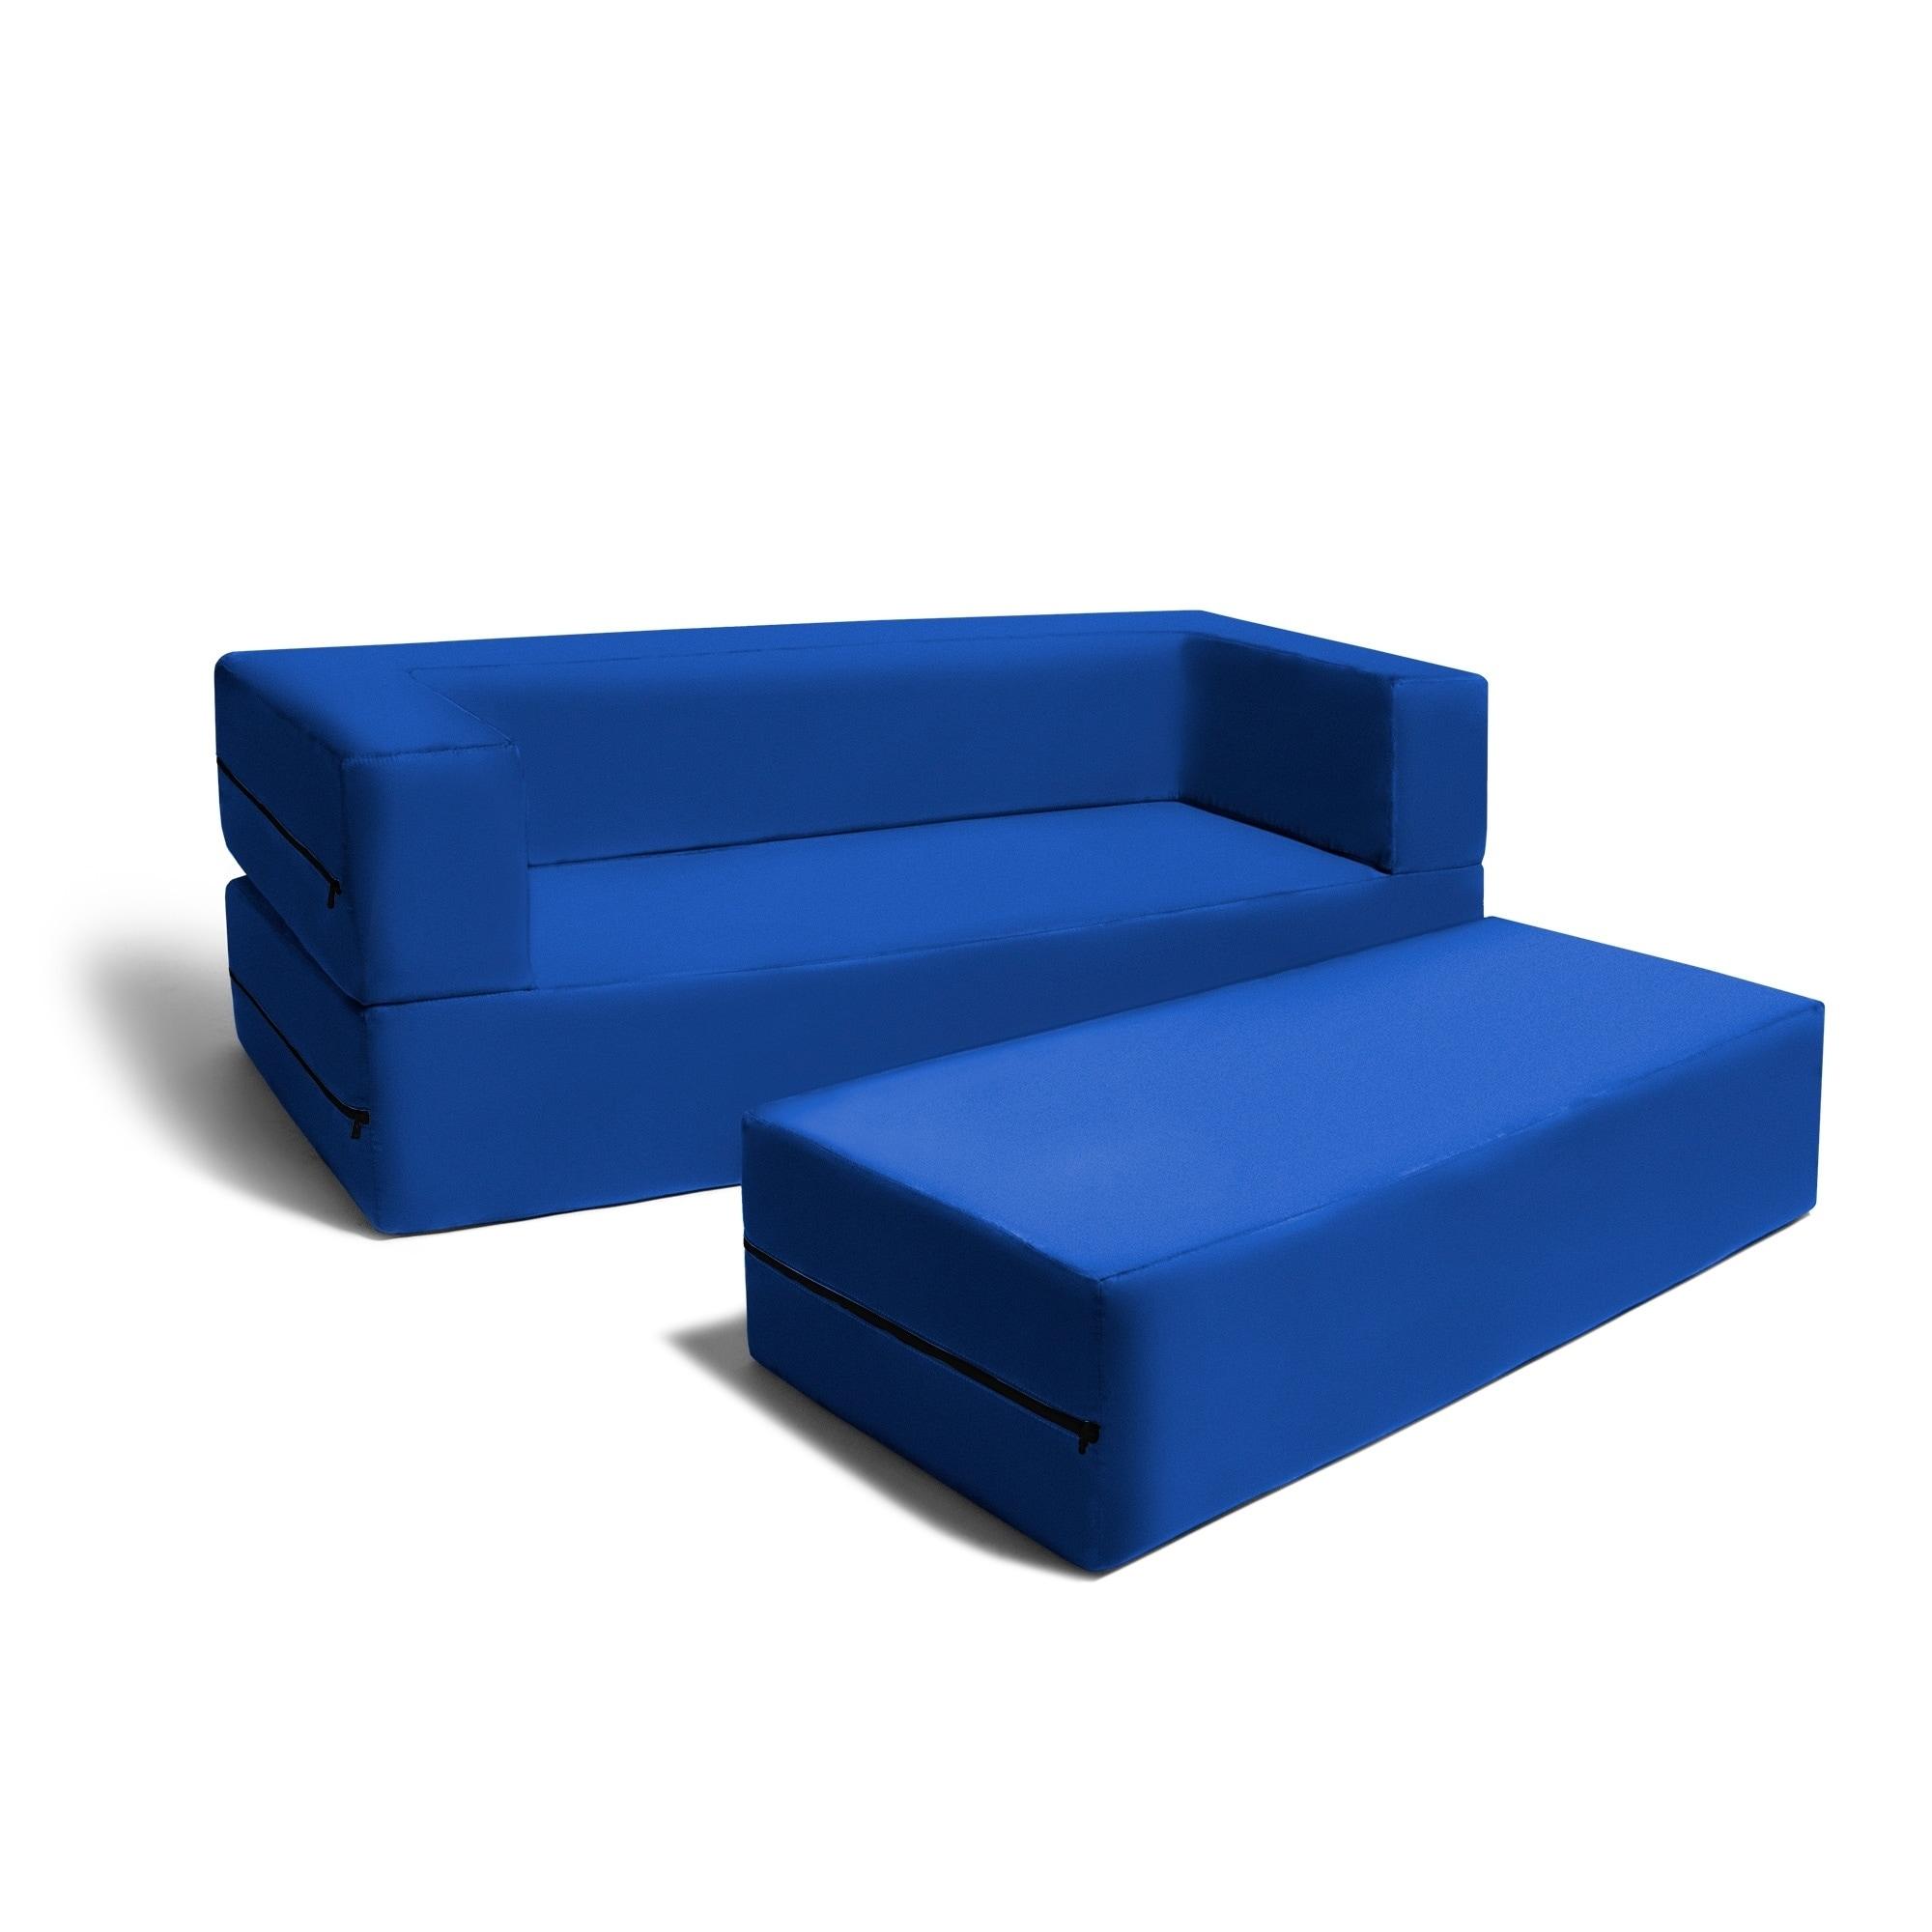 Shop Jaxx Big Kids Convertible Sleeper Sofa Ottoman Set Free